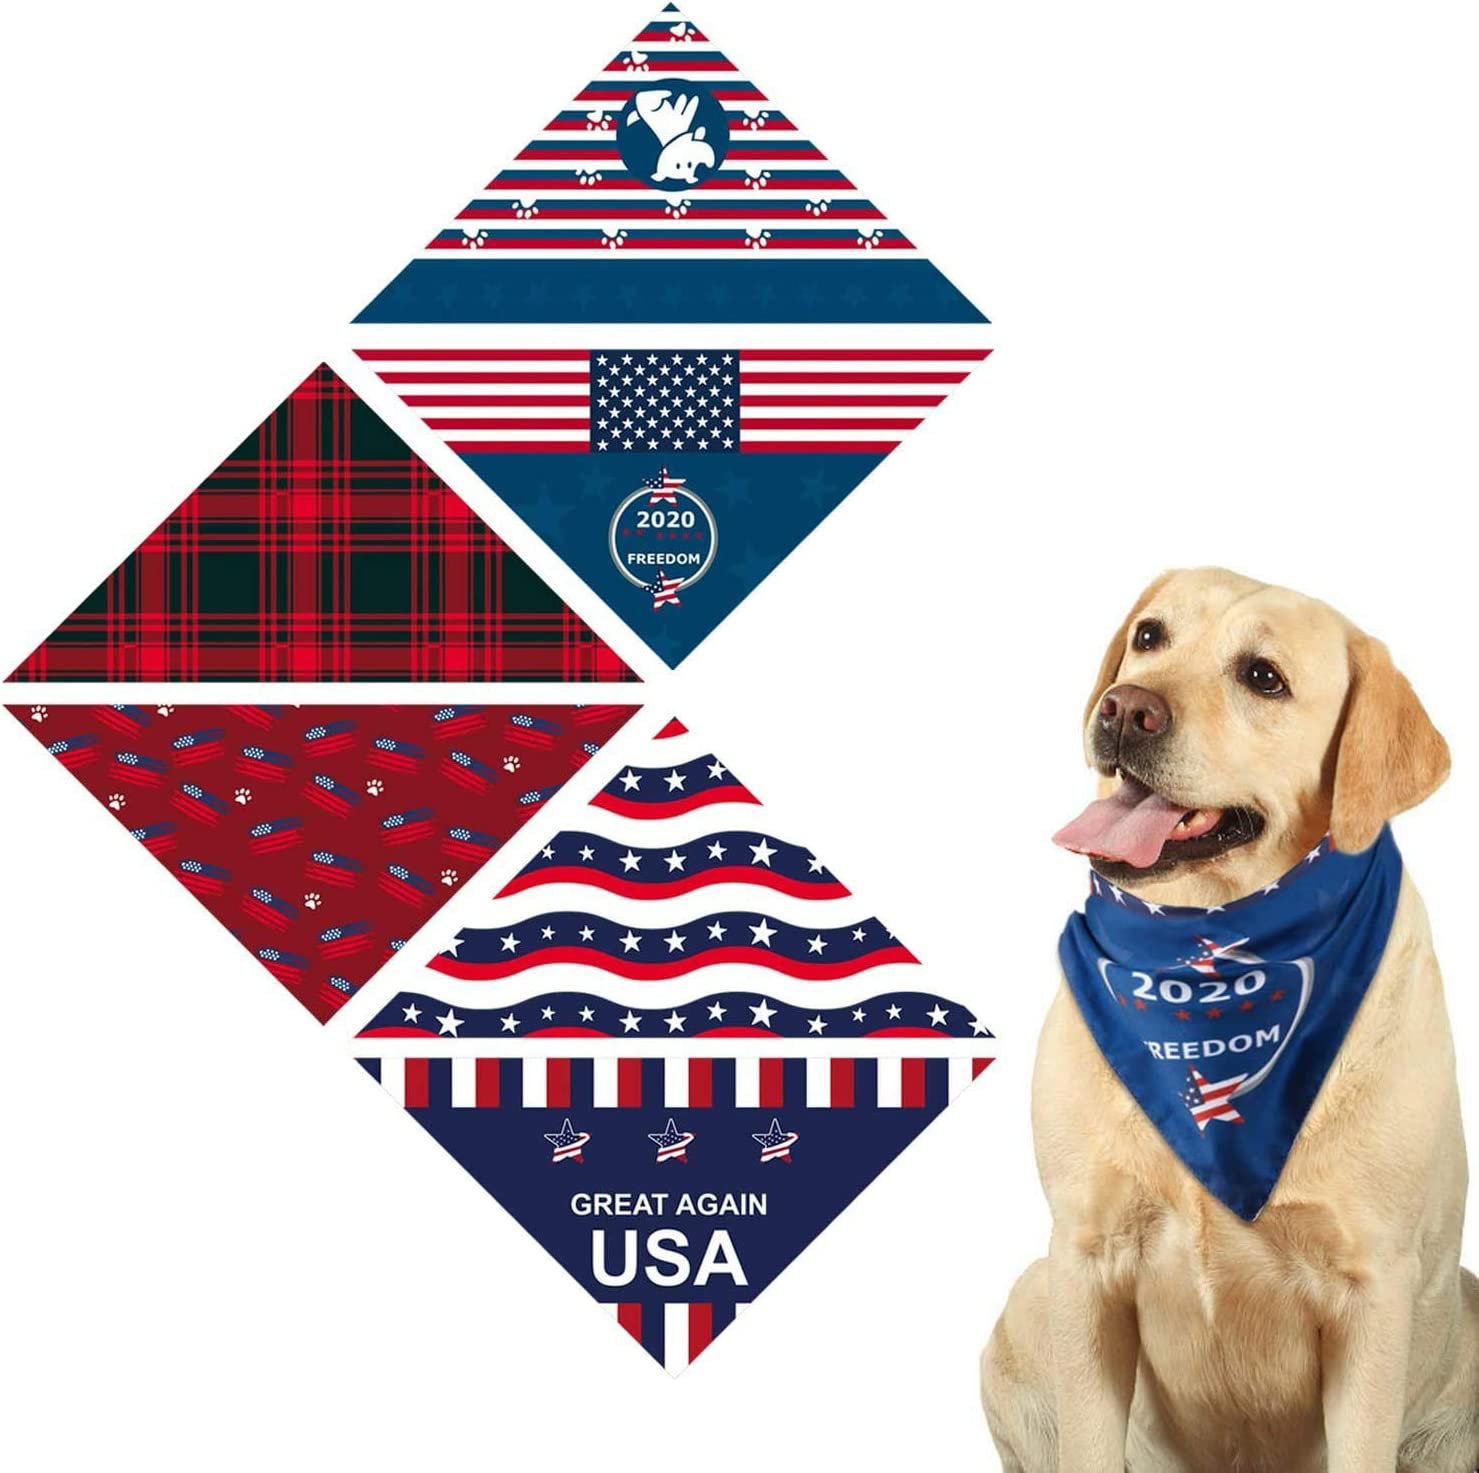 Halloween Tie On Pet Bandana  Dog Bandanas  Paw Print  Bandana  Free Shipping  Pet Accessories